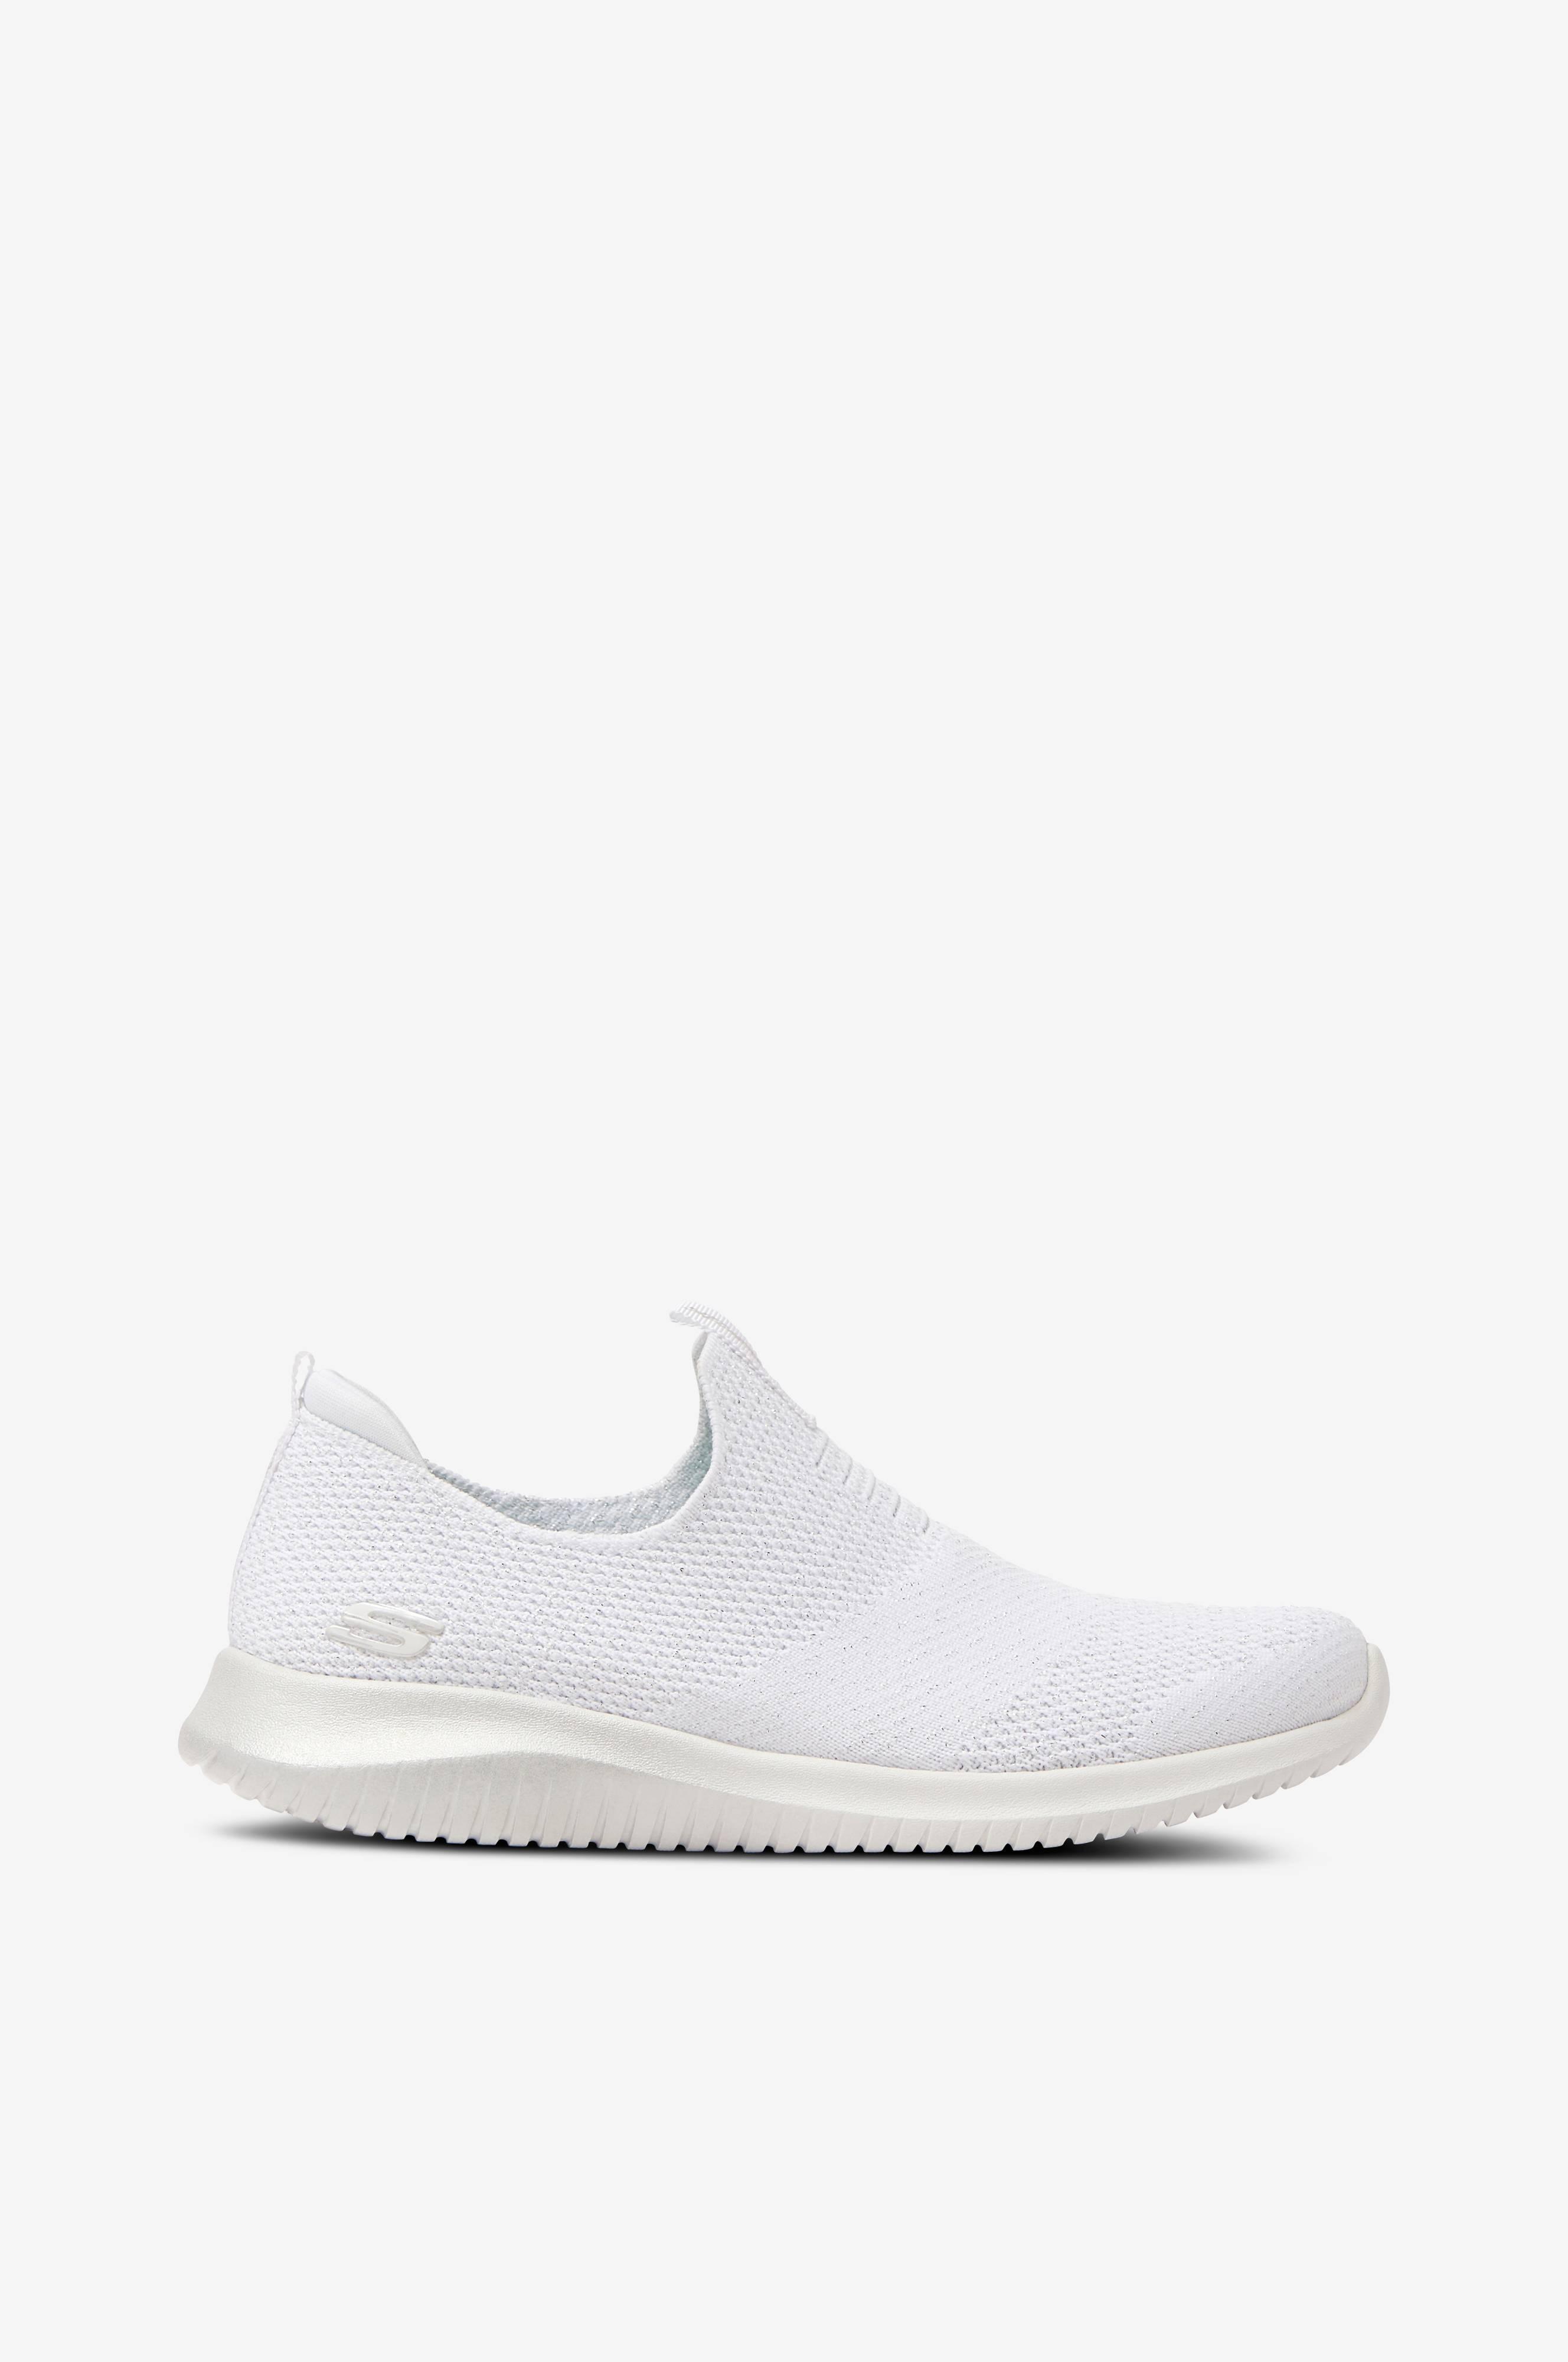 Sneakers Womens Ultra Flex First Take